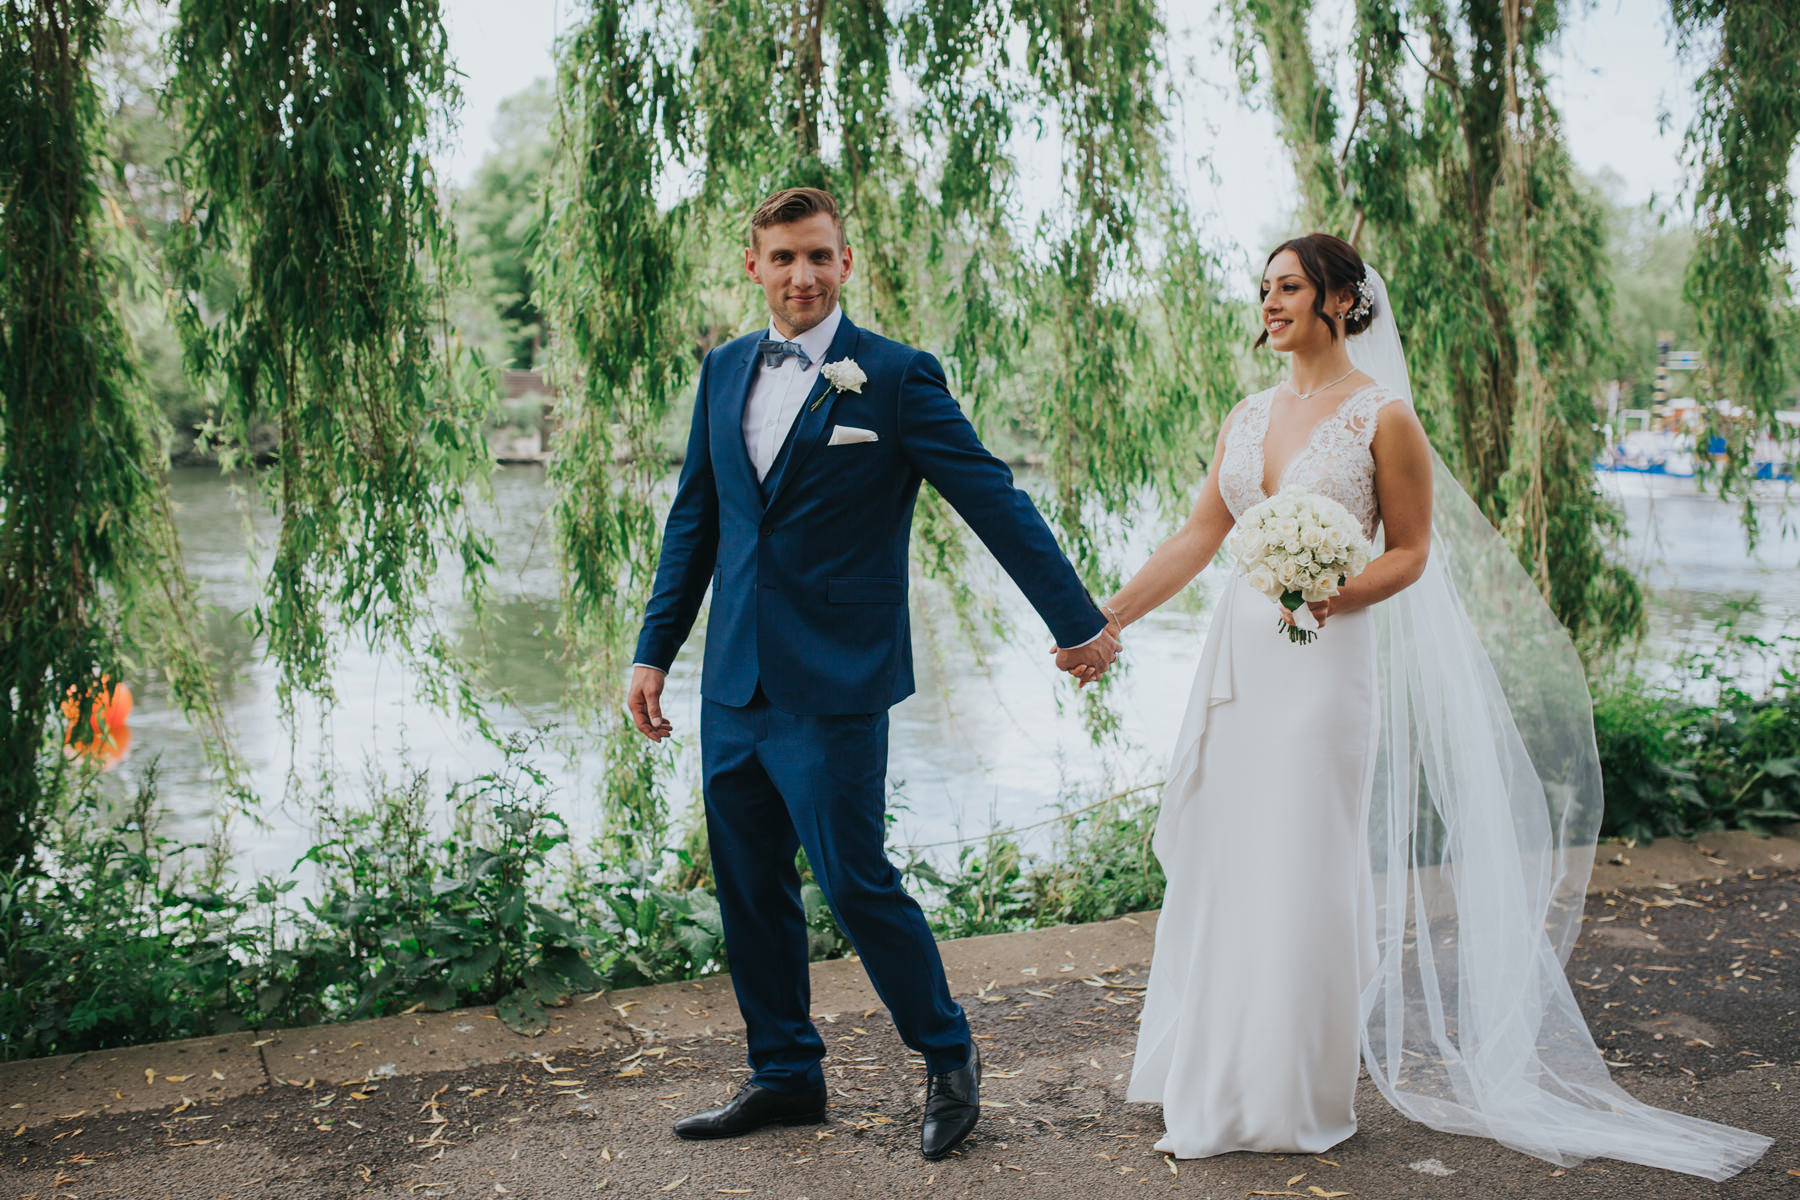 CRL-355-The Bingham wedding Richmond-Claire Rob bridal couple portraits on Thamespath.jpg